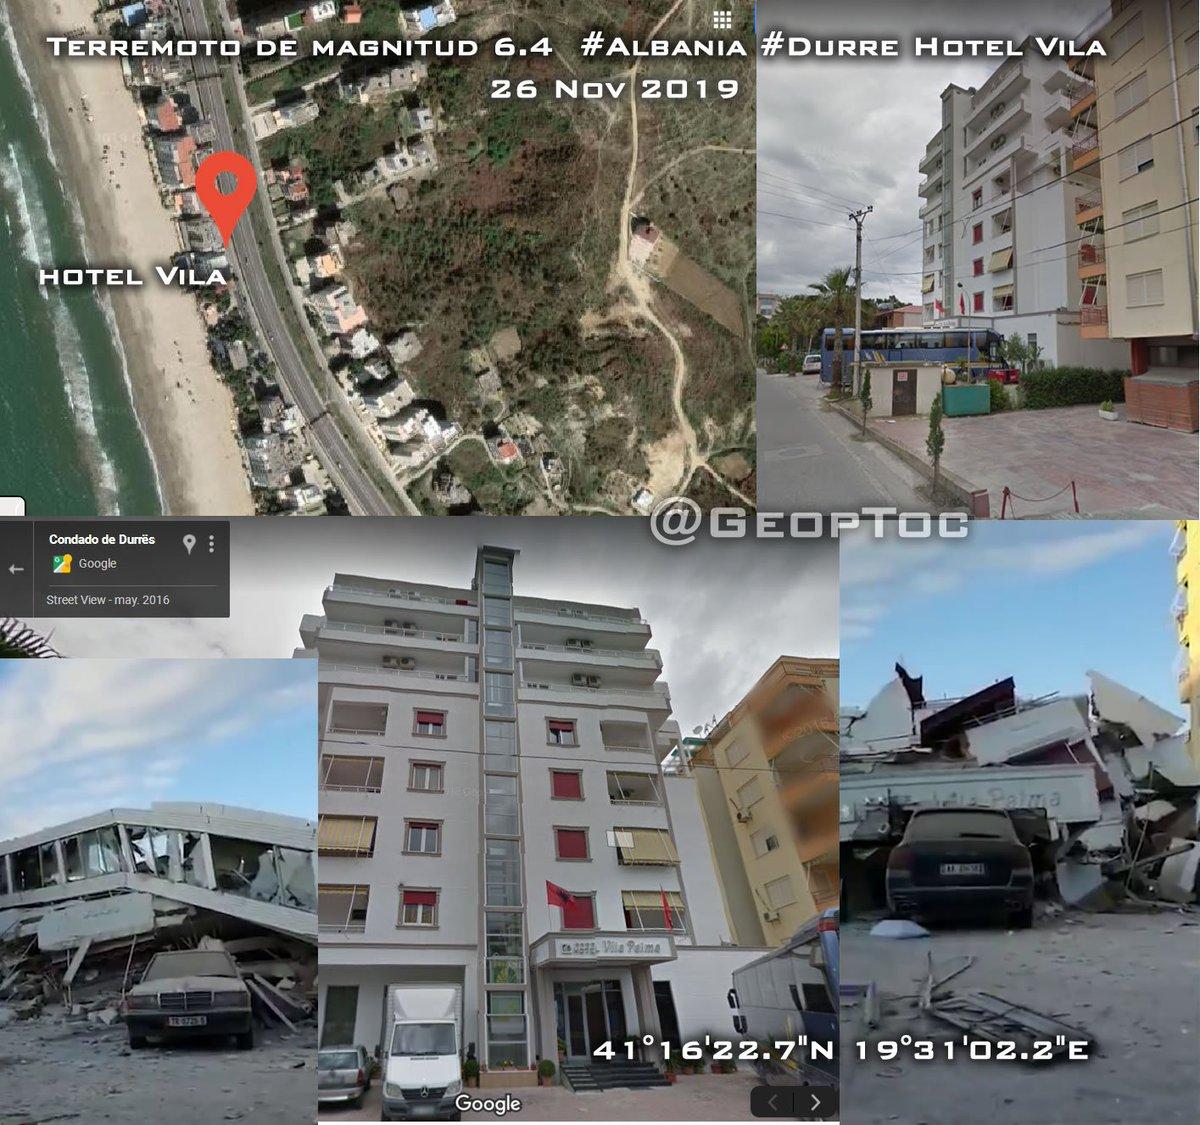 Seguimiento mundial de sismos - Página 5 EKSlAImWwAALU9o